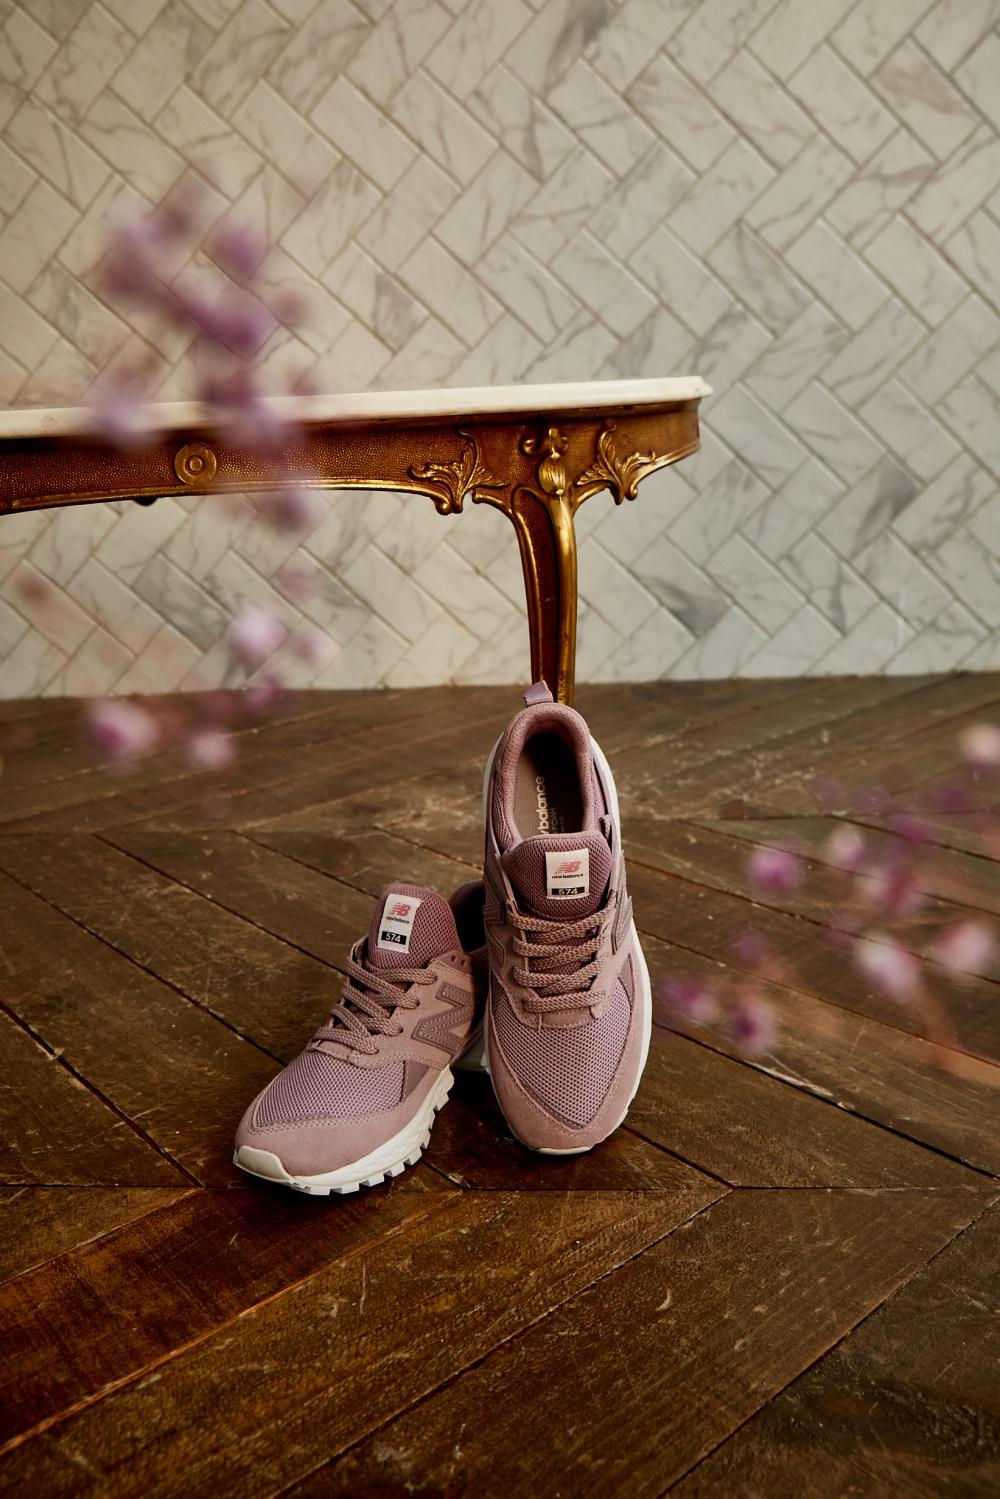 3643a44a394b7 New Balance經典數字潮鞋再推新作574S v2 無所不型由我定義全新上市 ...